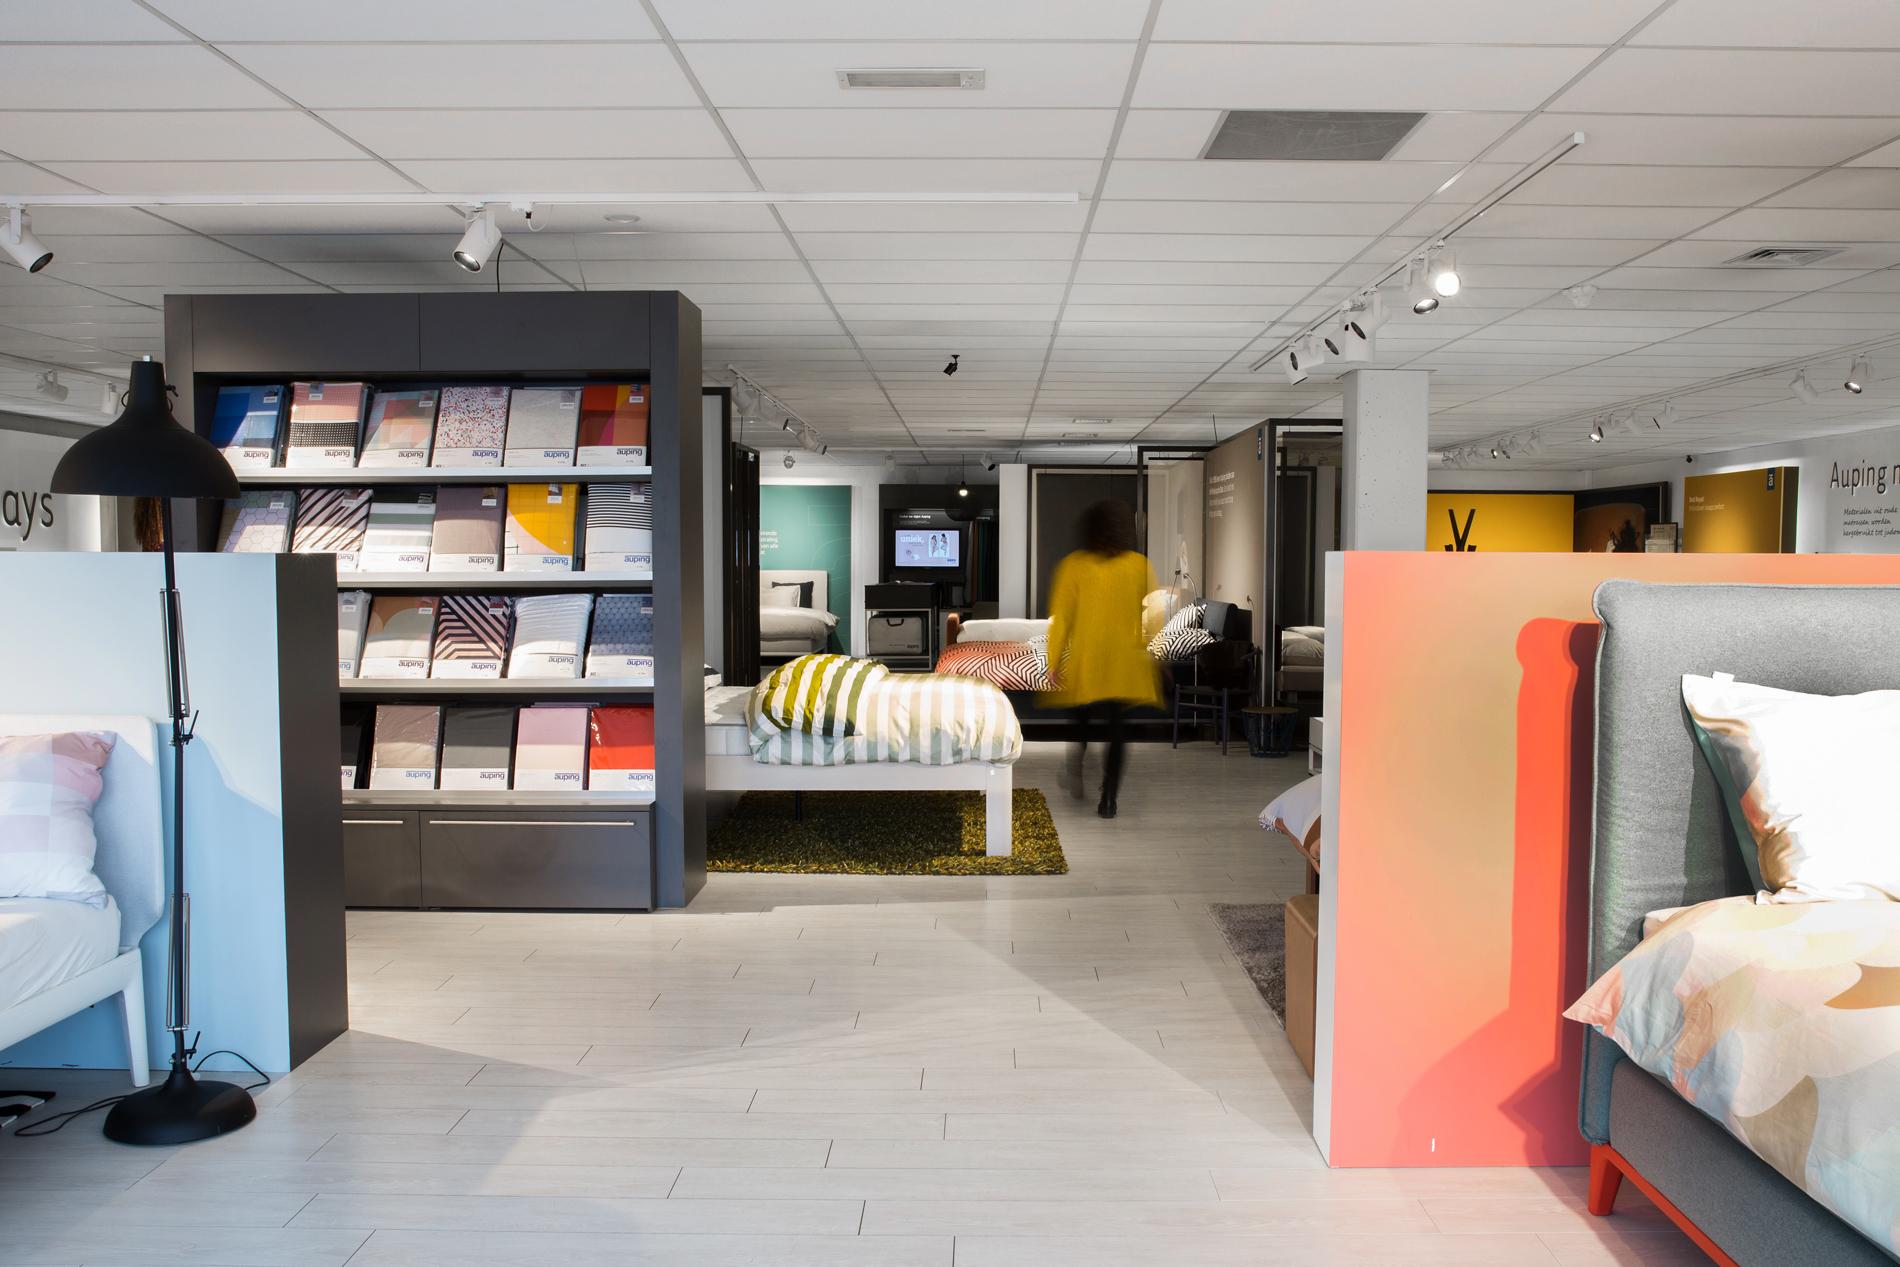 Auping Plaza Naaldwijk – Natural Vita Talalay Latex Mattress Store in Naaldwijk ZH